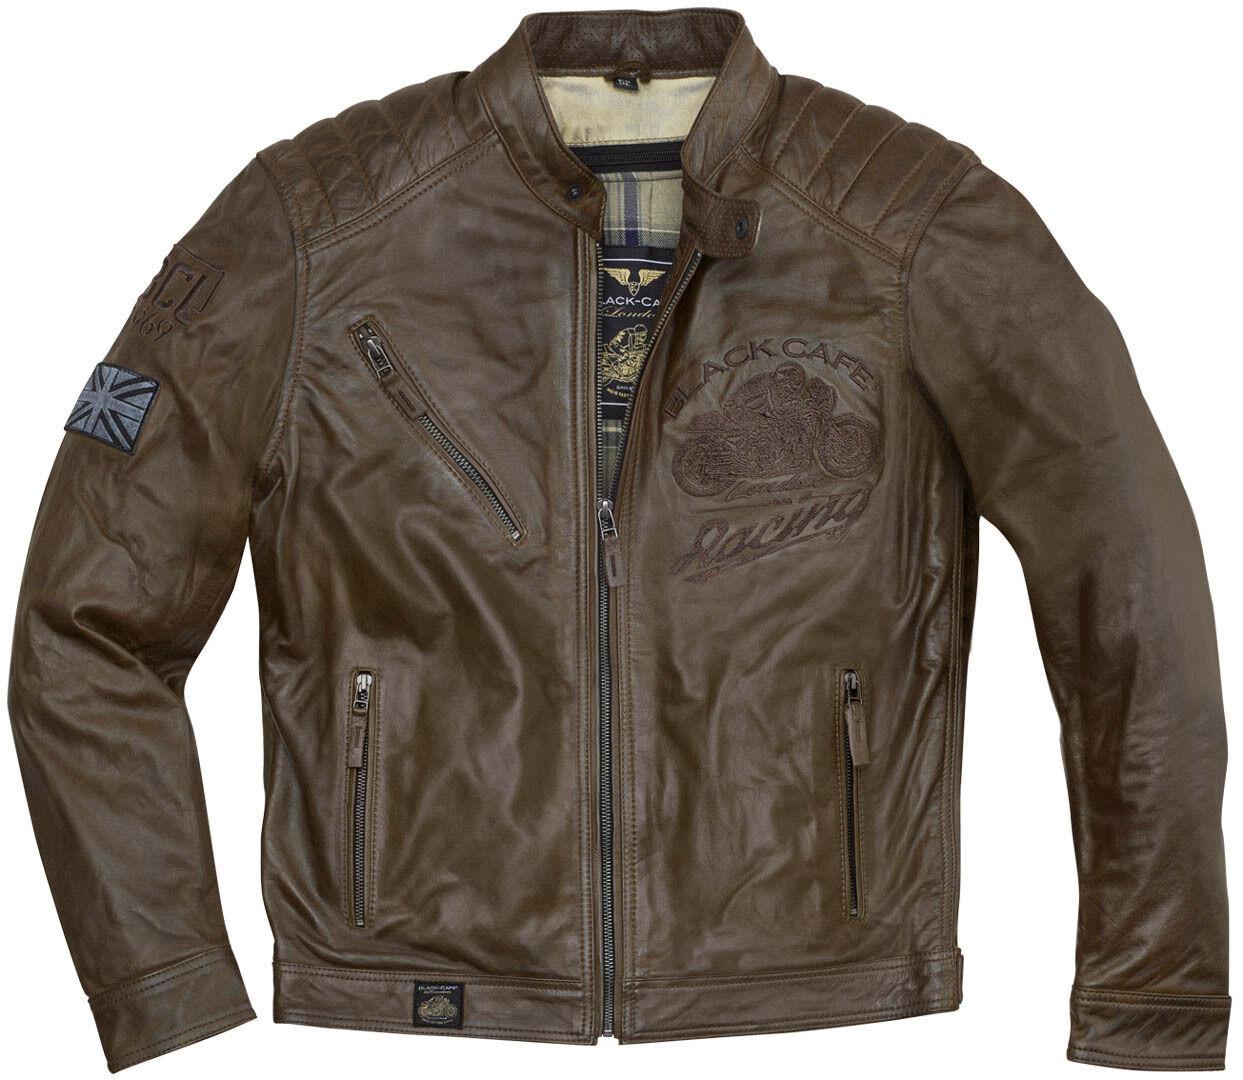 Black-Cafe London Black Cafe London Houston Veste en cuir de moto Brun taille : 50